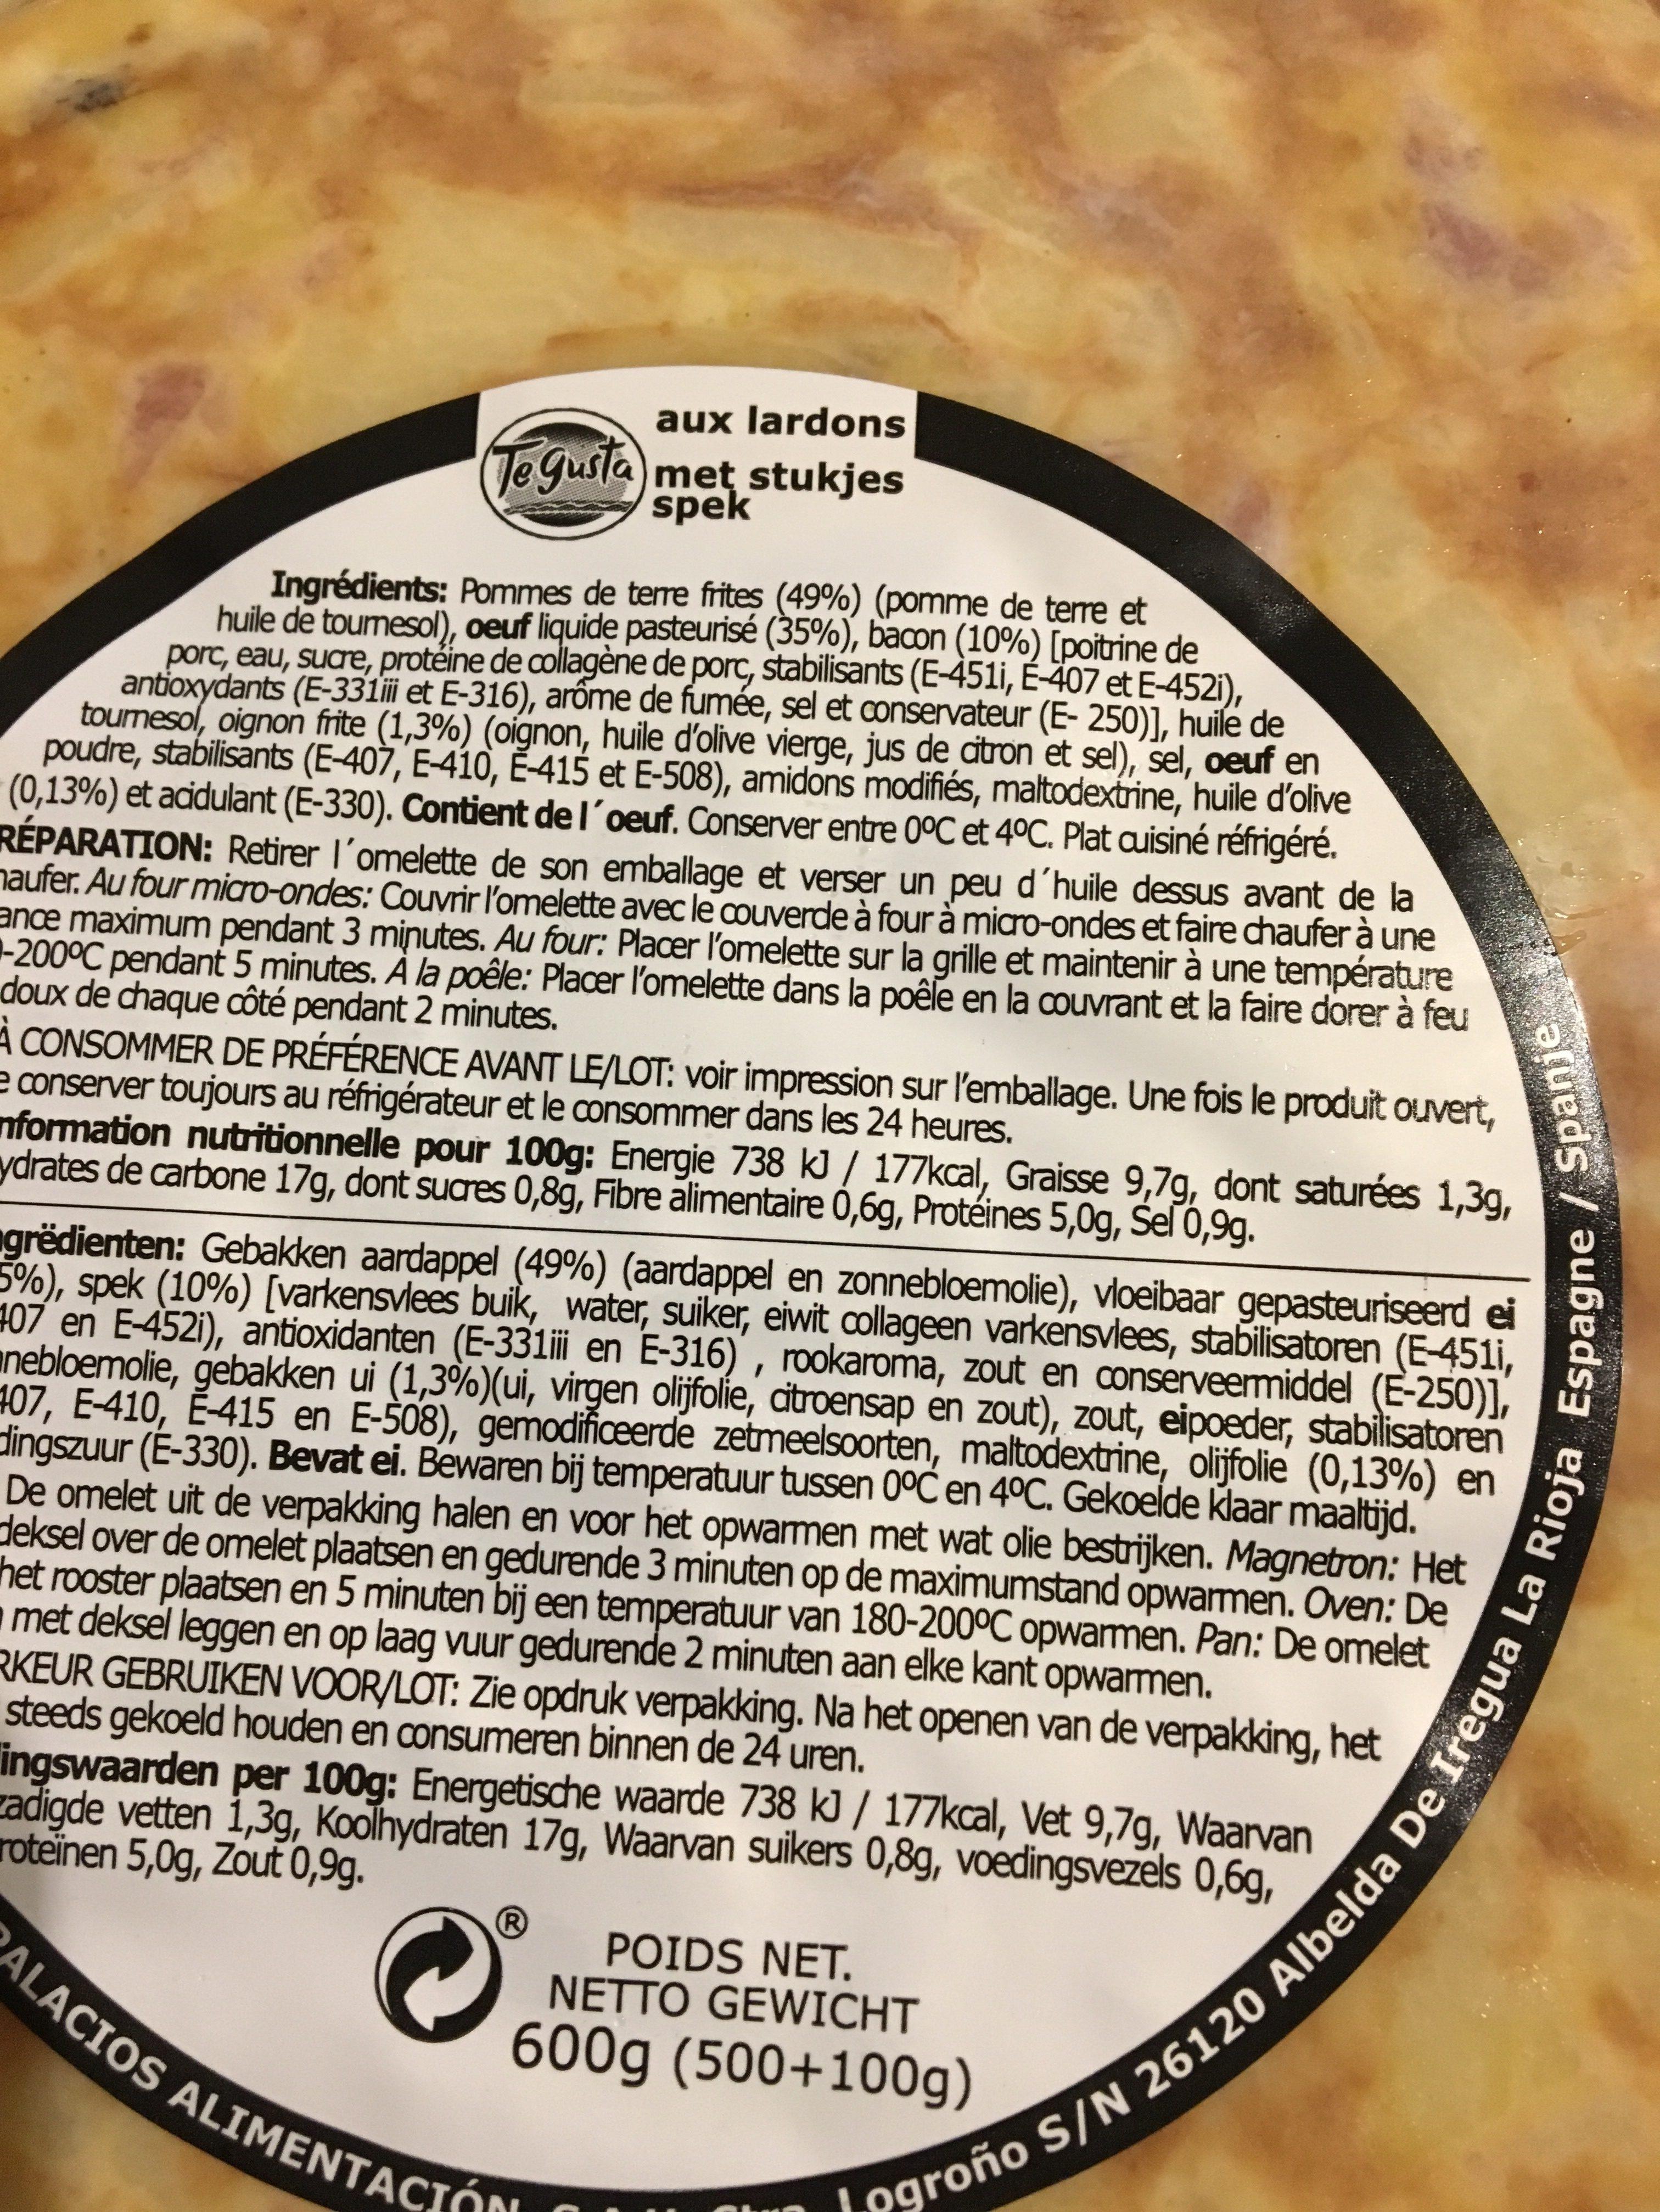 Te Gusta, Tortilla Aux Lardons, Le Paquet, 500g - Ingrediënten - fr